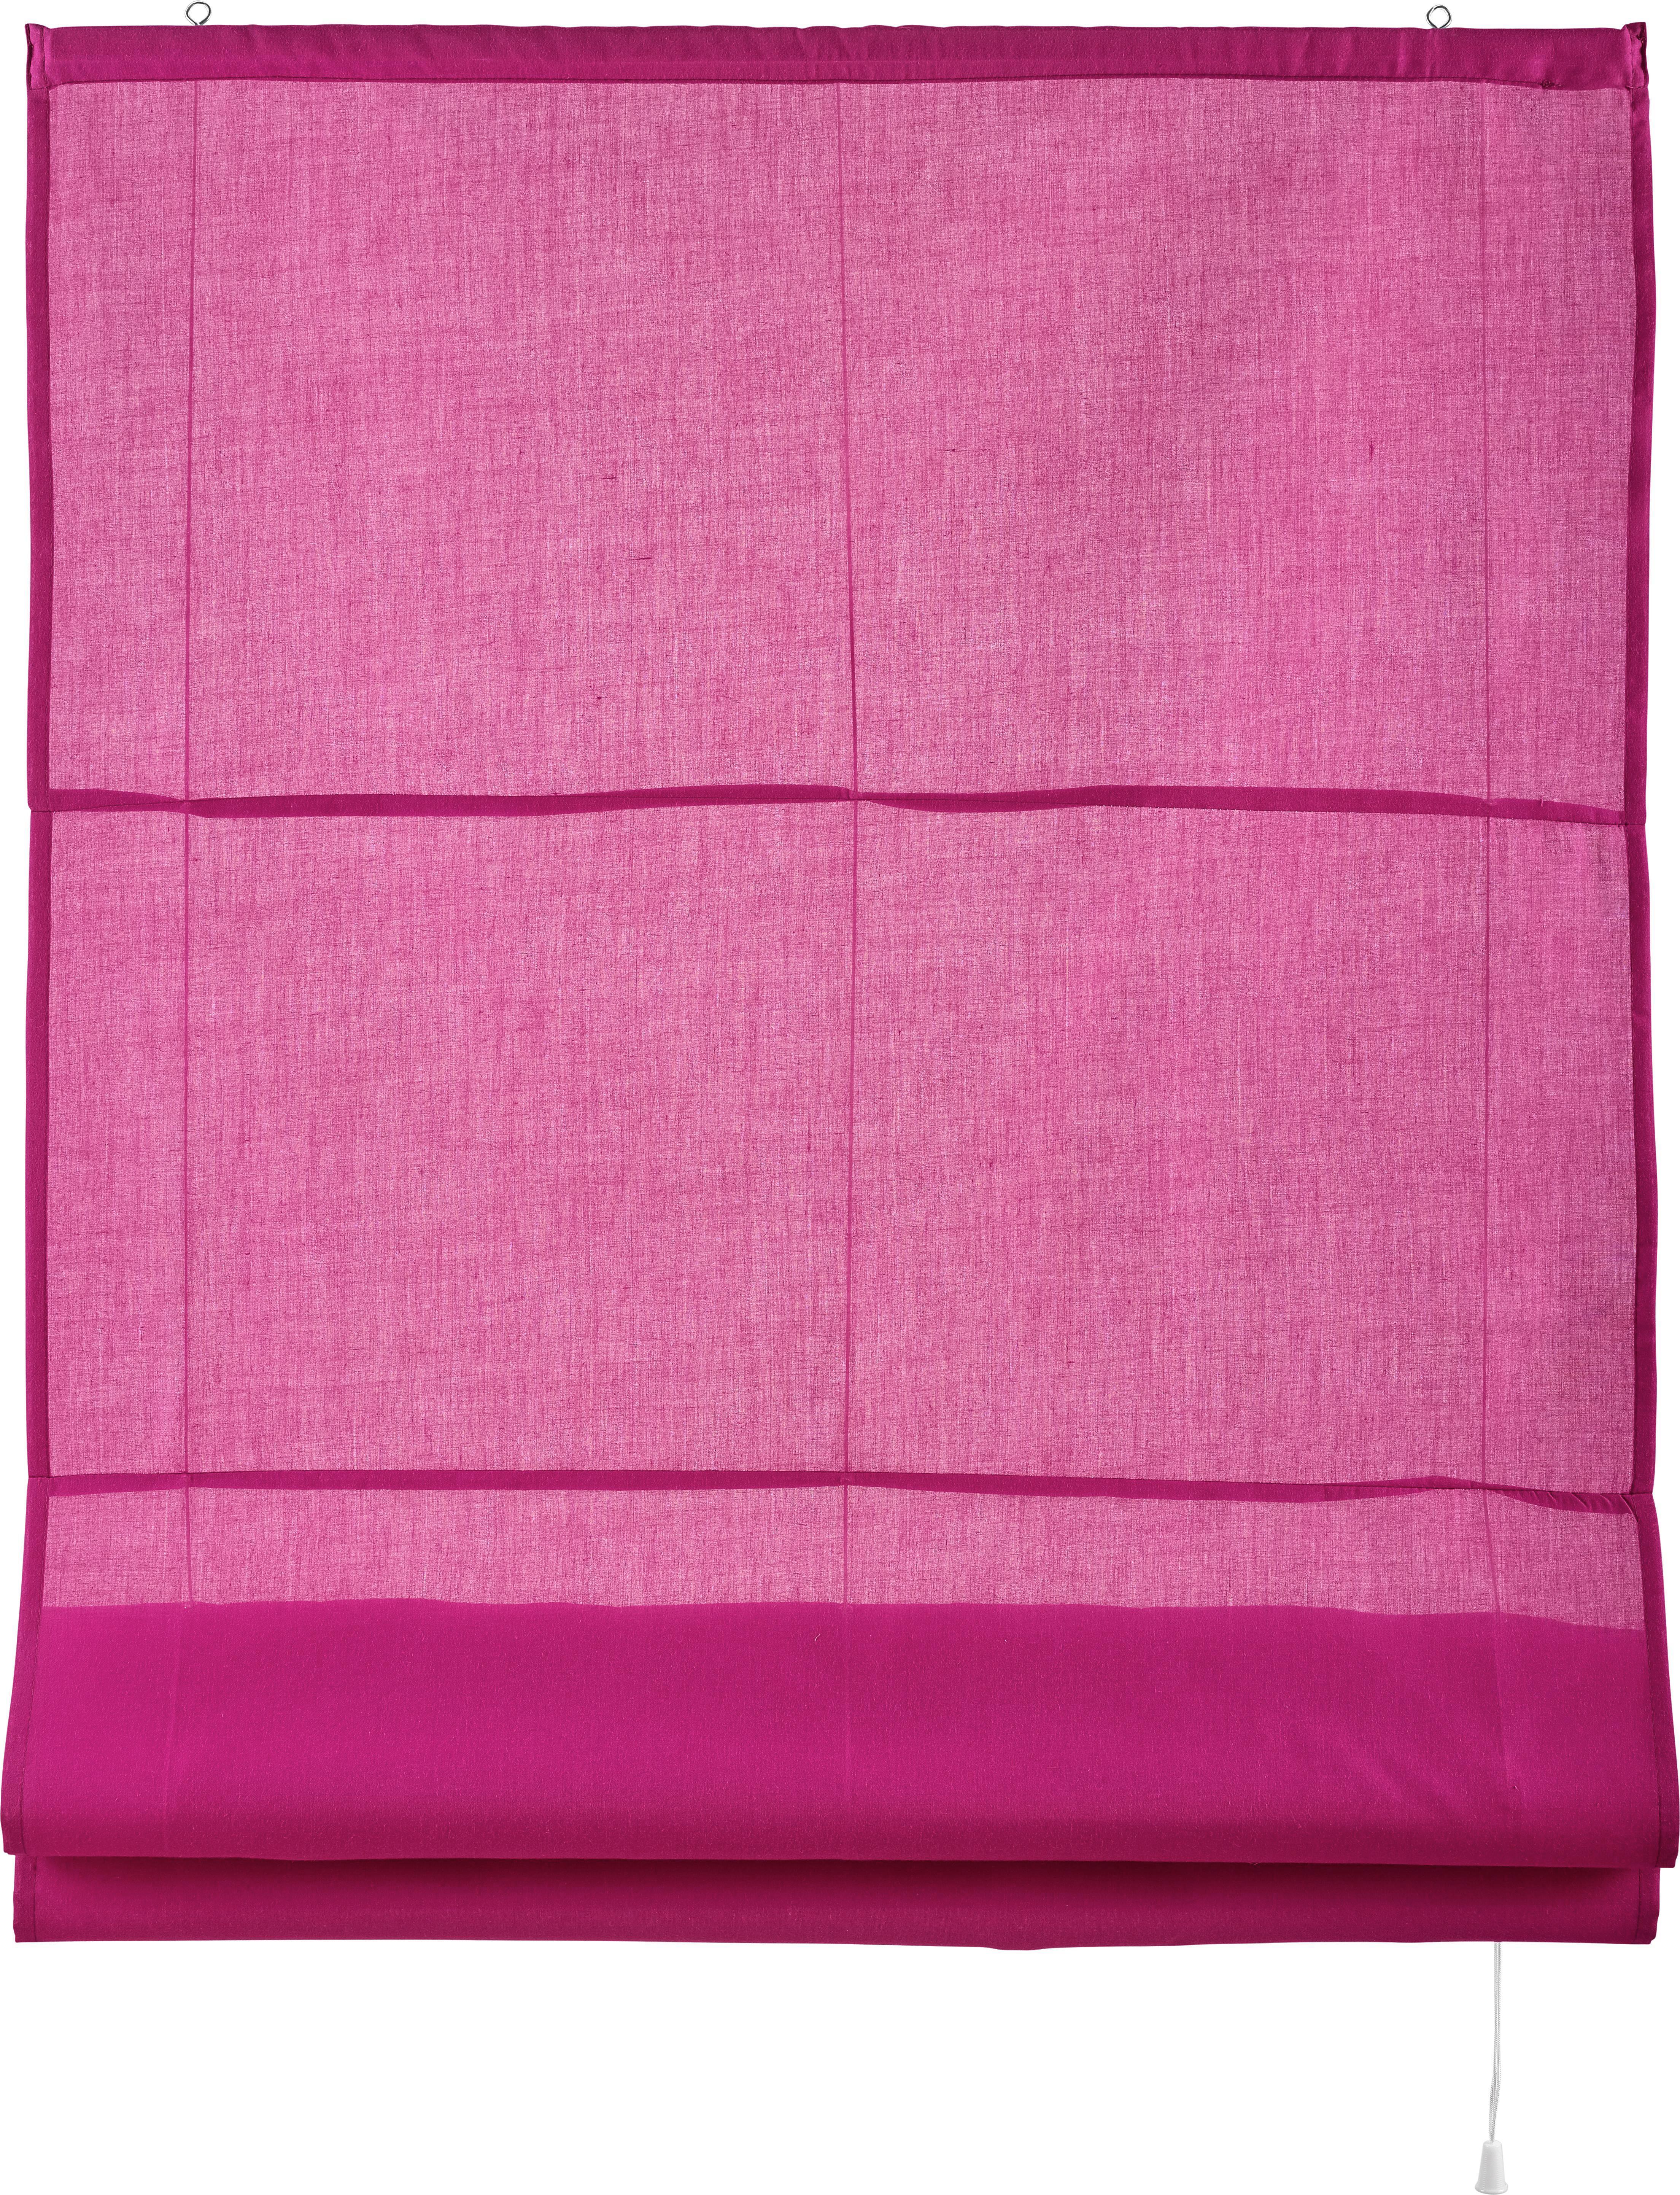 Raffrollo Finn in Pink, ca. 100x170cm - Pink, Textil (100/170cm) - MÖMAX modern living